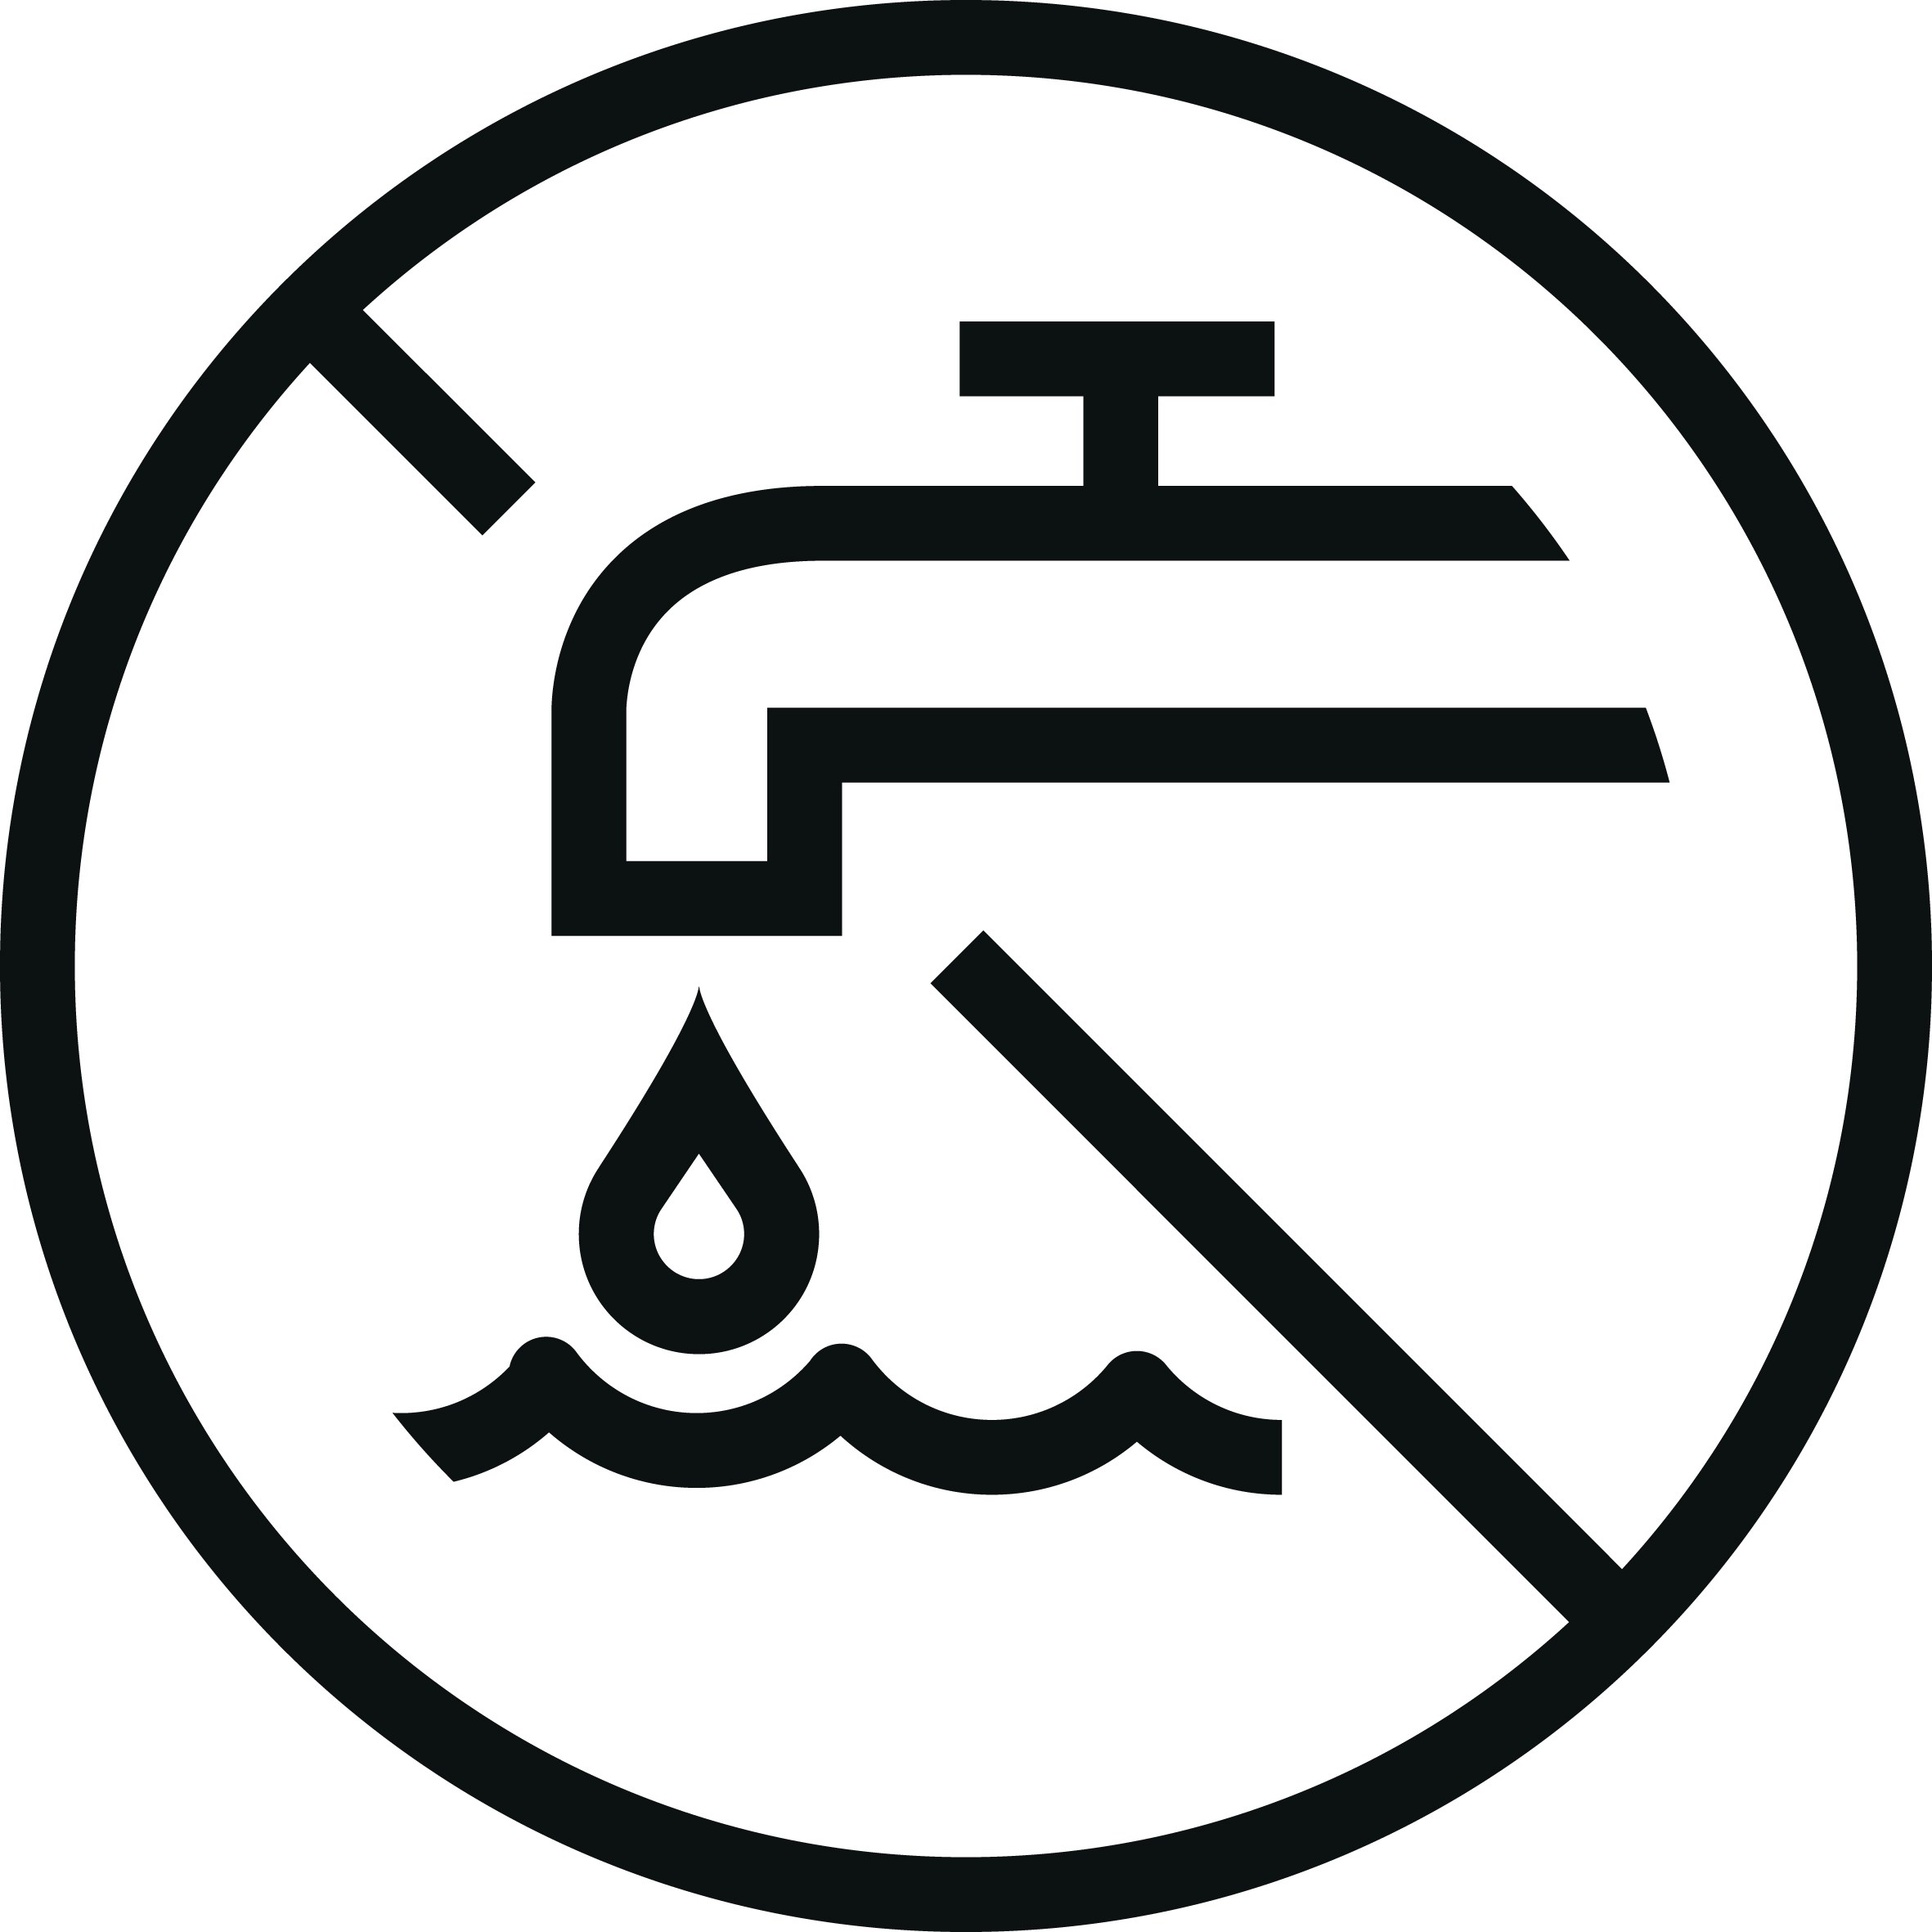 Aqua_Control-PSAAFL16PC569013.jpg